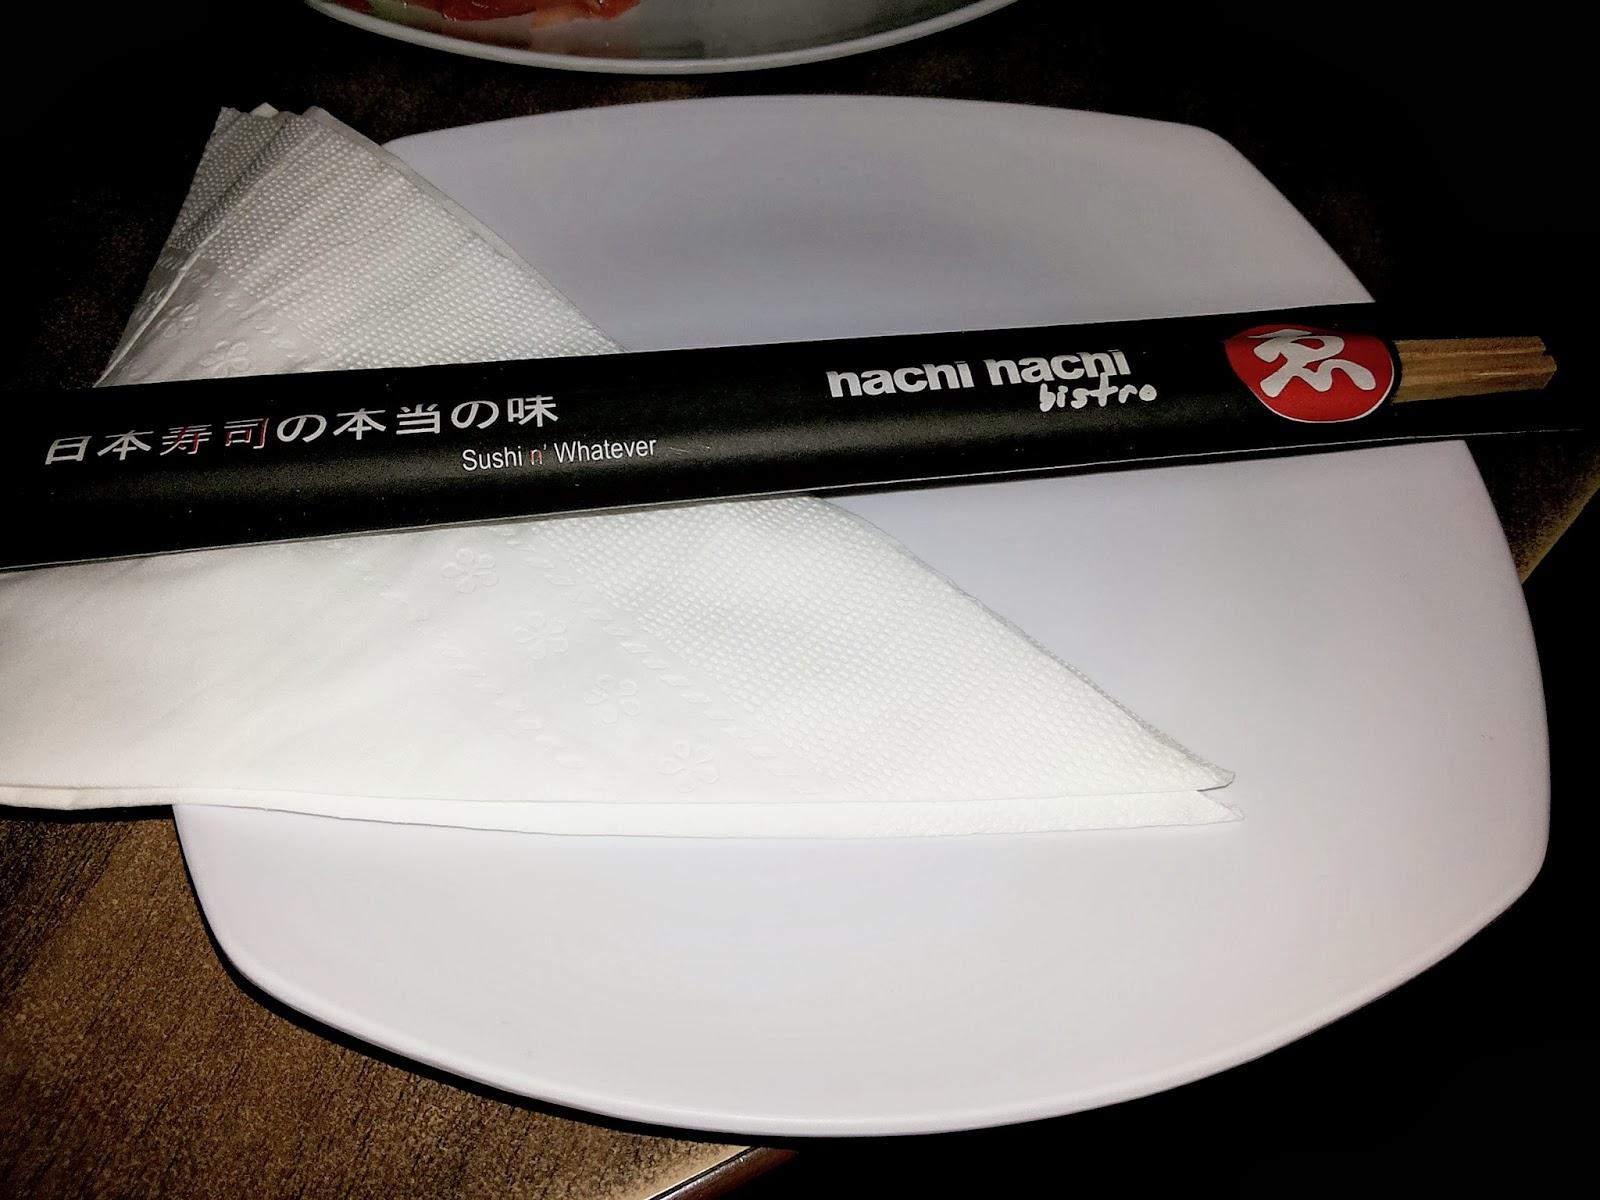 Restoran Sushi Hachi Hachi Bistro MX Mall Malang Dijamin Bikin Ngiler dan Ketagihan